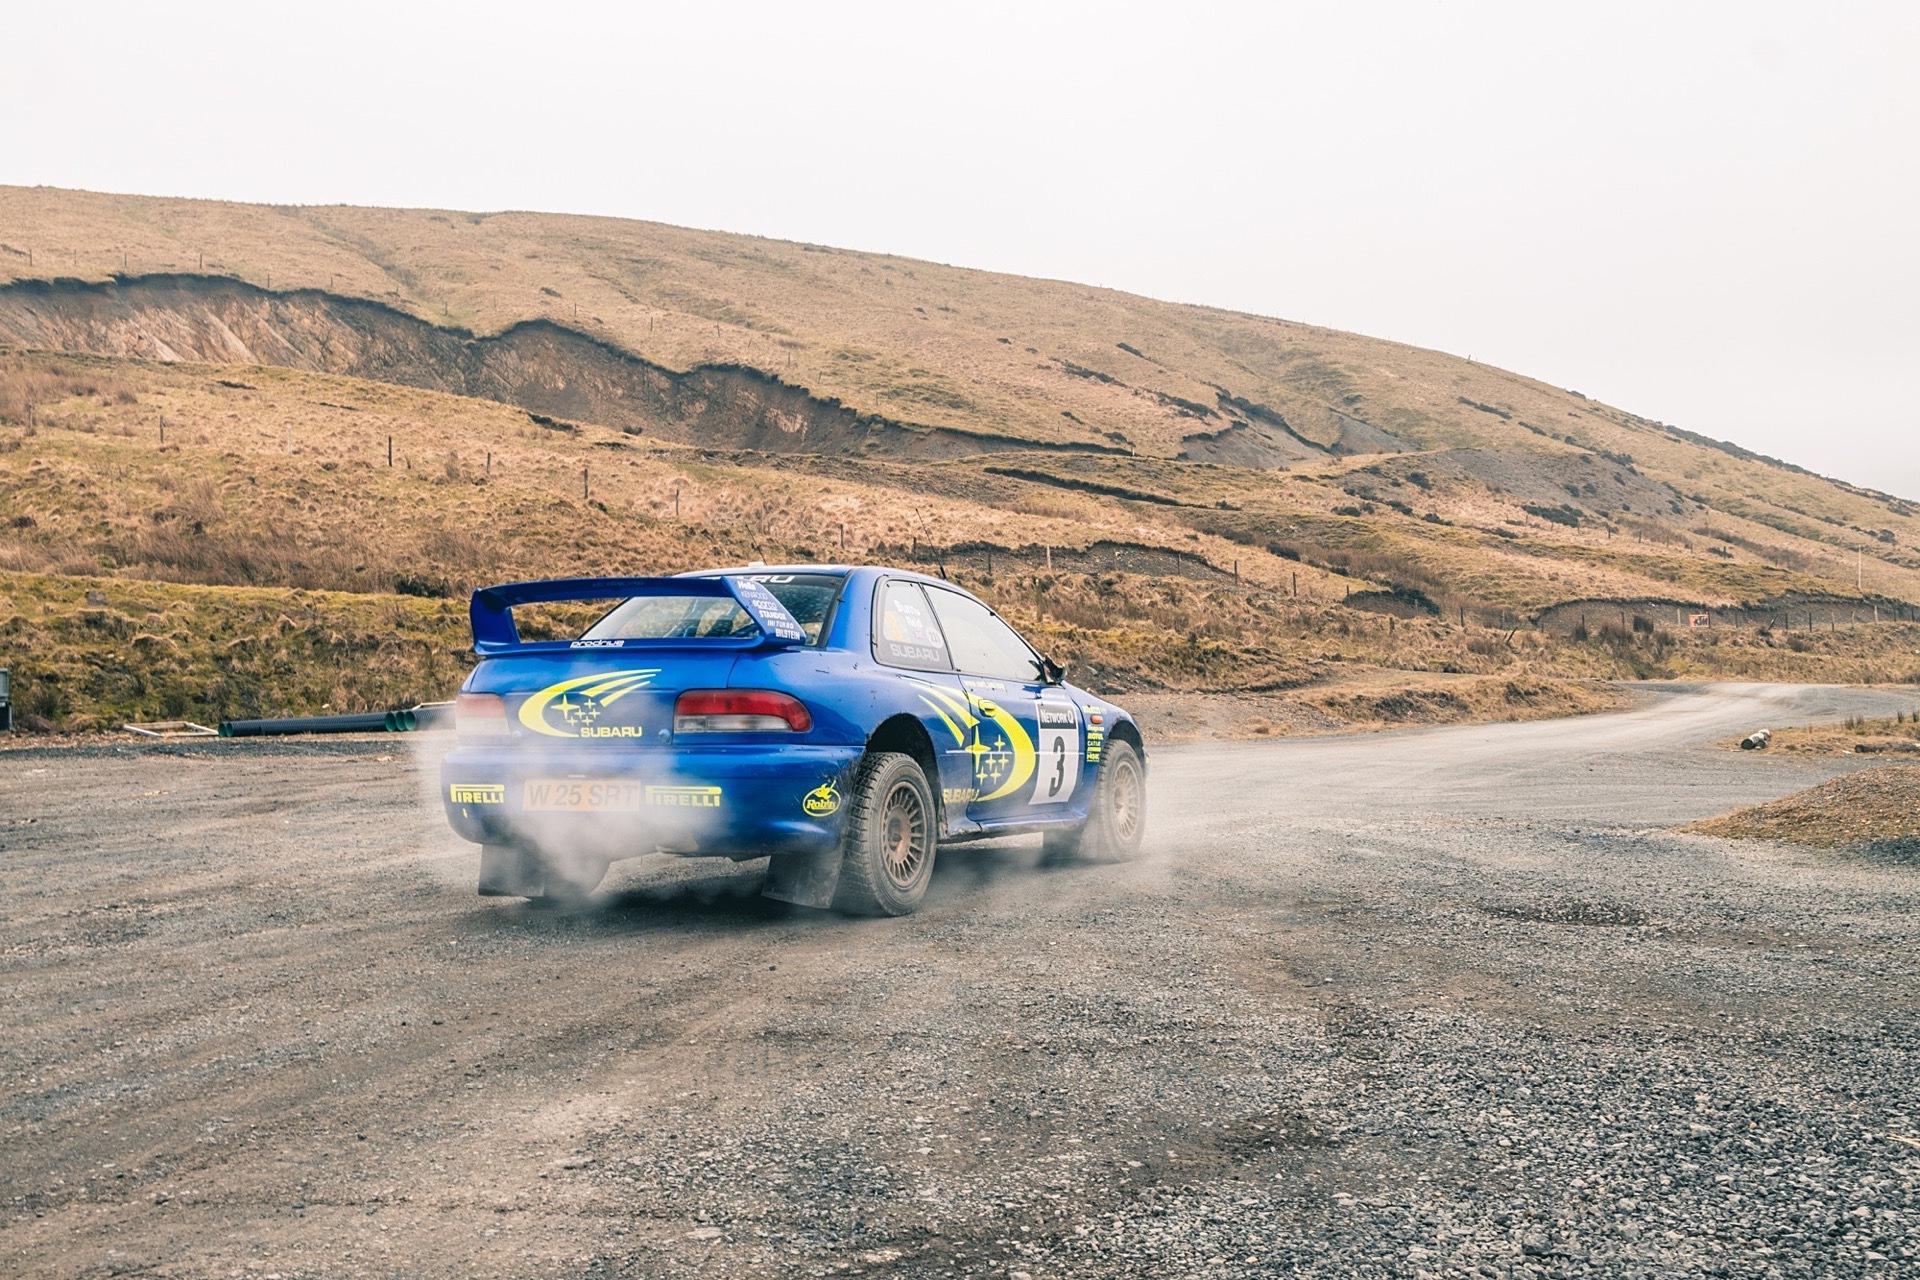 Richard_Burns_Subaru_Impreza_WRC_sale-0019